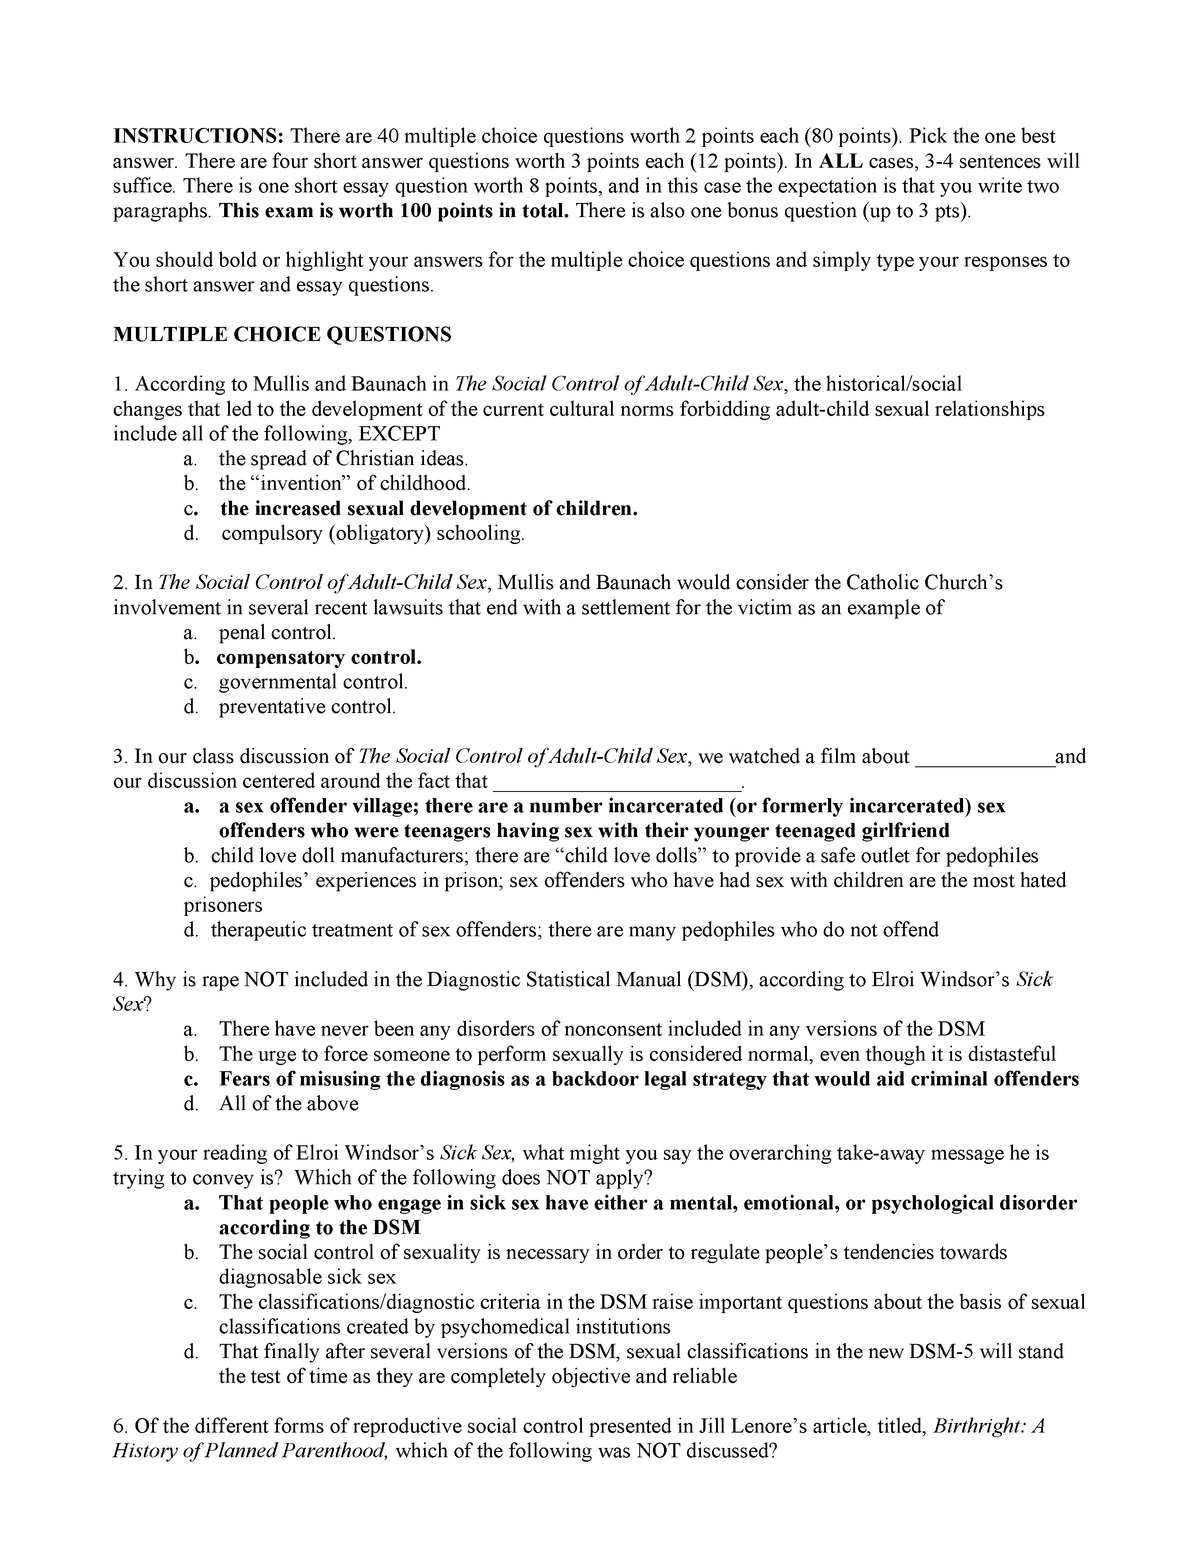 Exam 2017 - SOC 570: Sexual Behavior - StuDocu